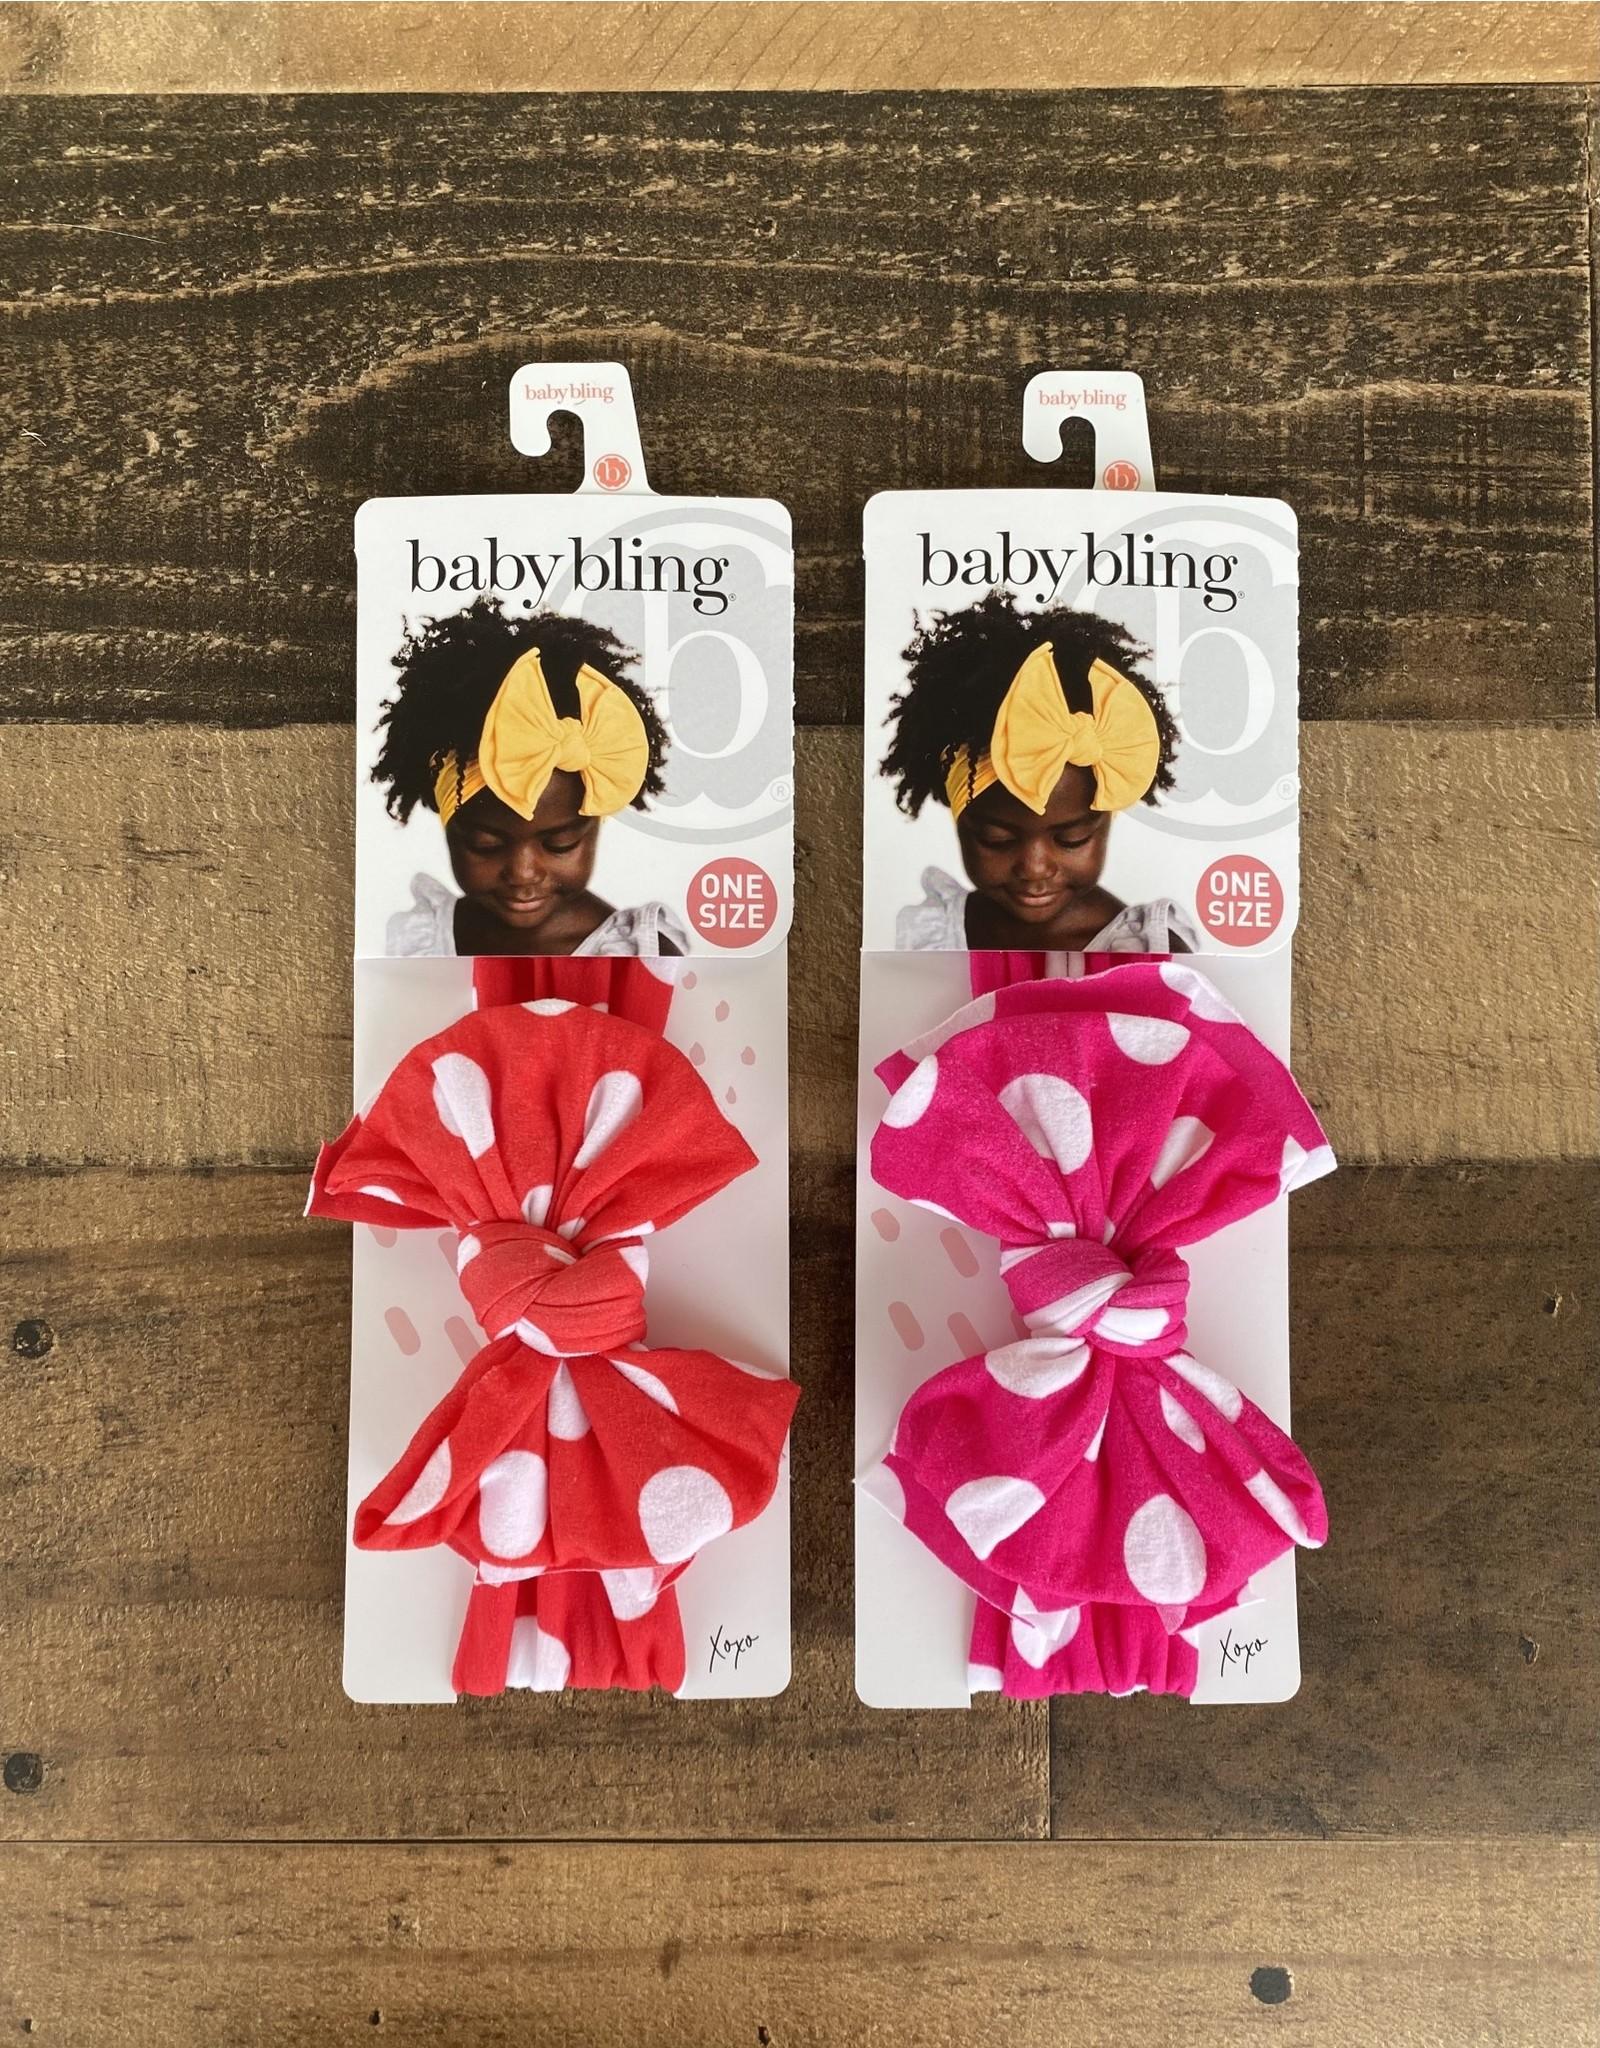 Baby Bling Baby Bling - Printed FAB Polka Dot